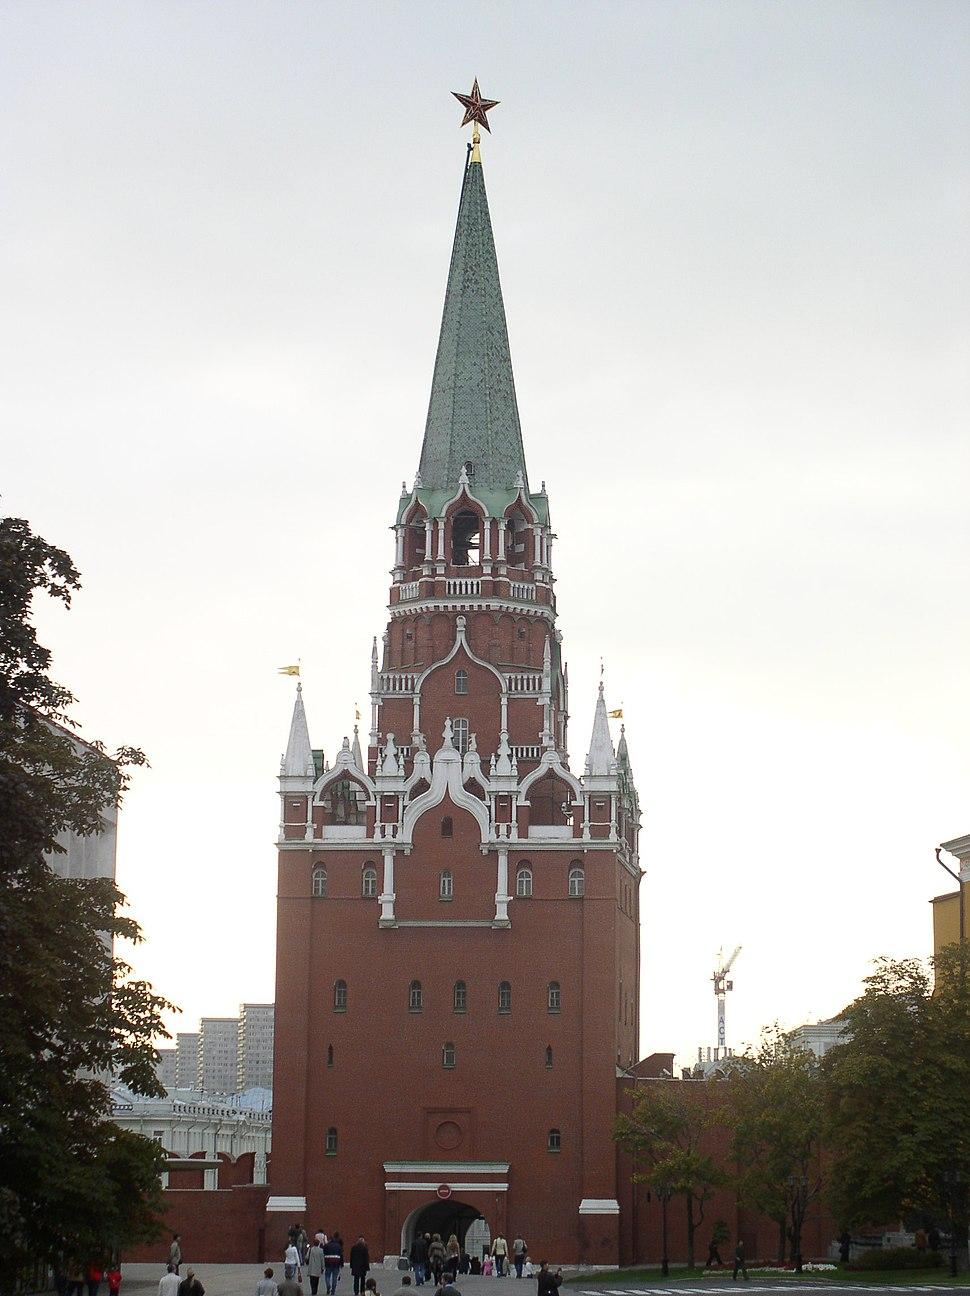 Russia-Moscow-Kremlin-Trinity Tower-1